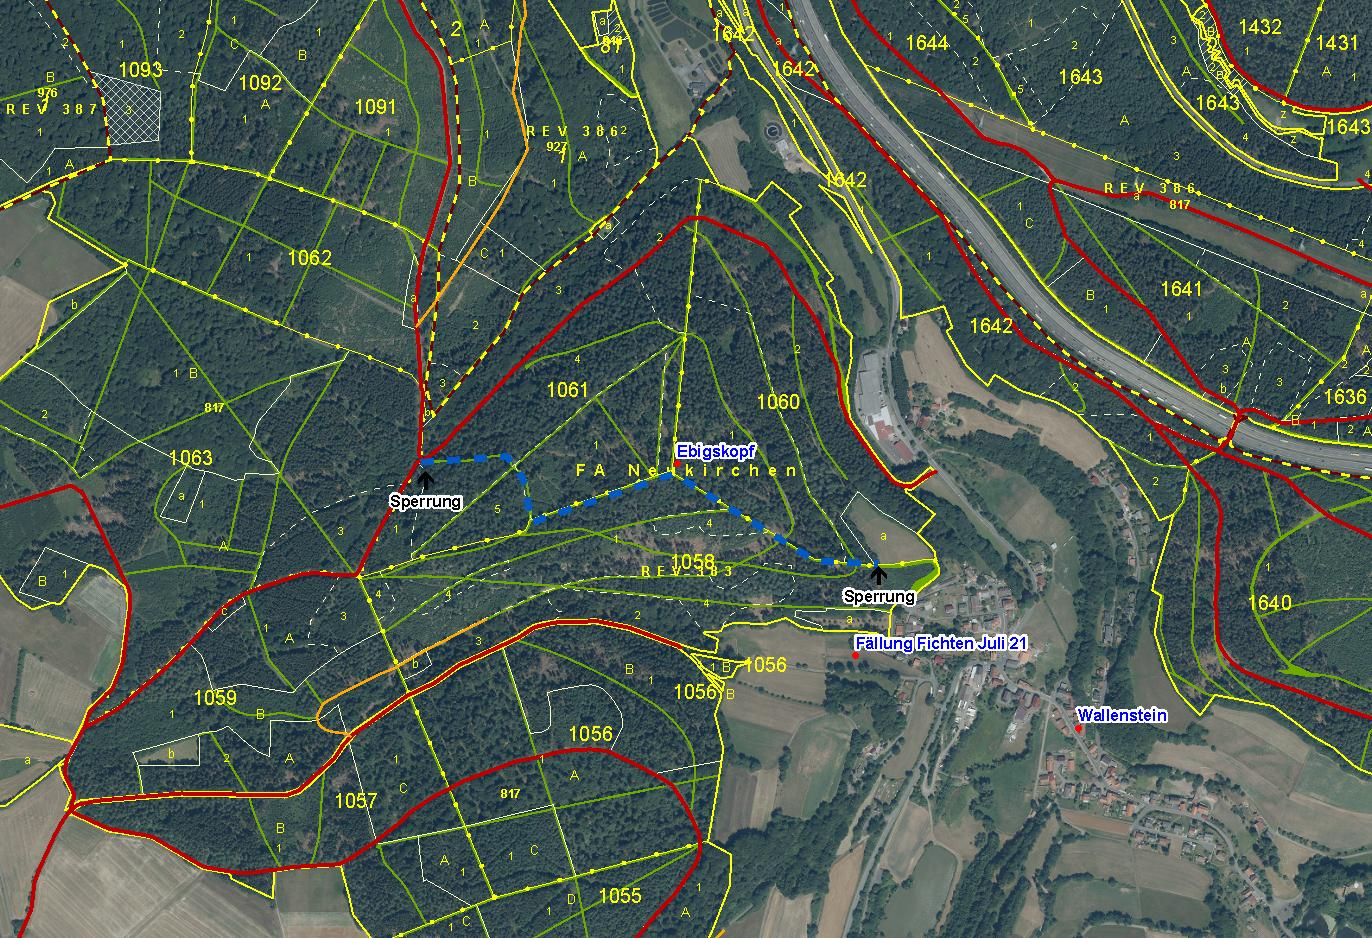 Sperrung wg. Baumfällarbeiten_VKS L-Weg_2021_Juli